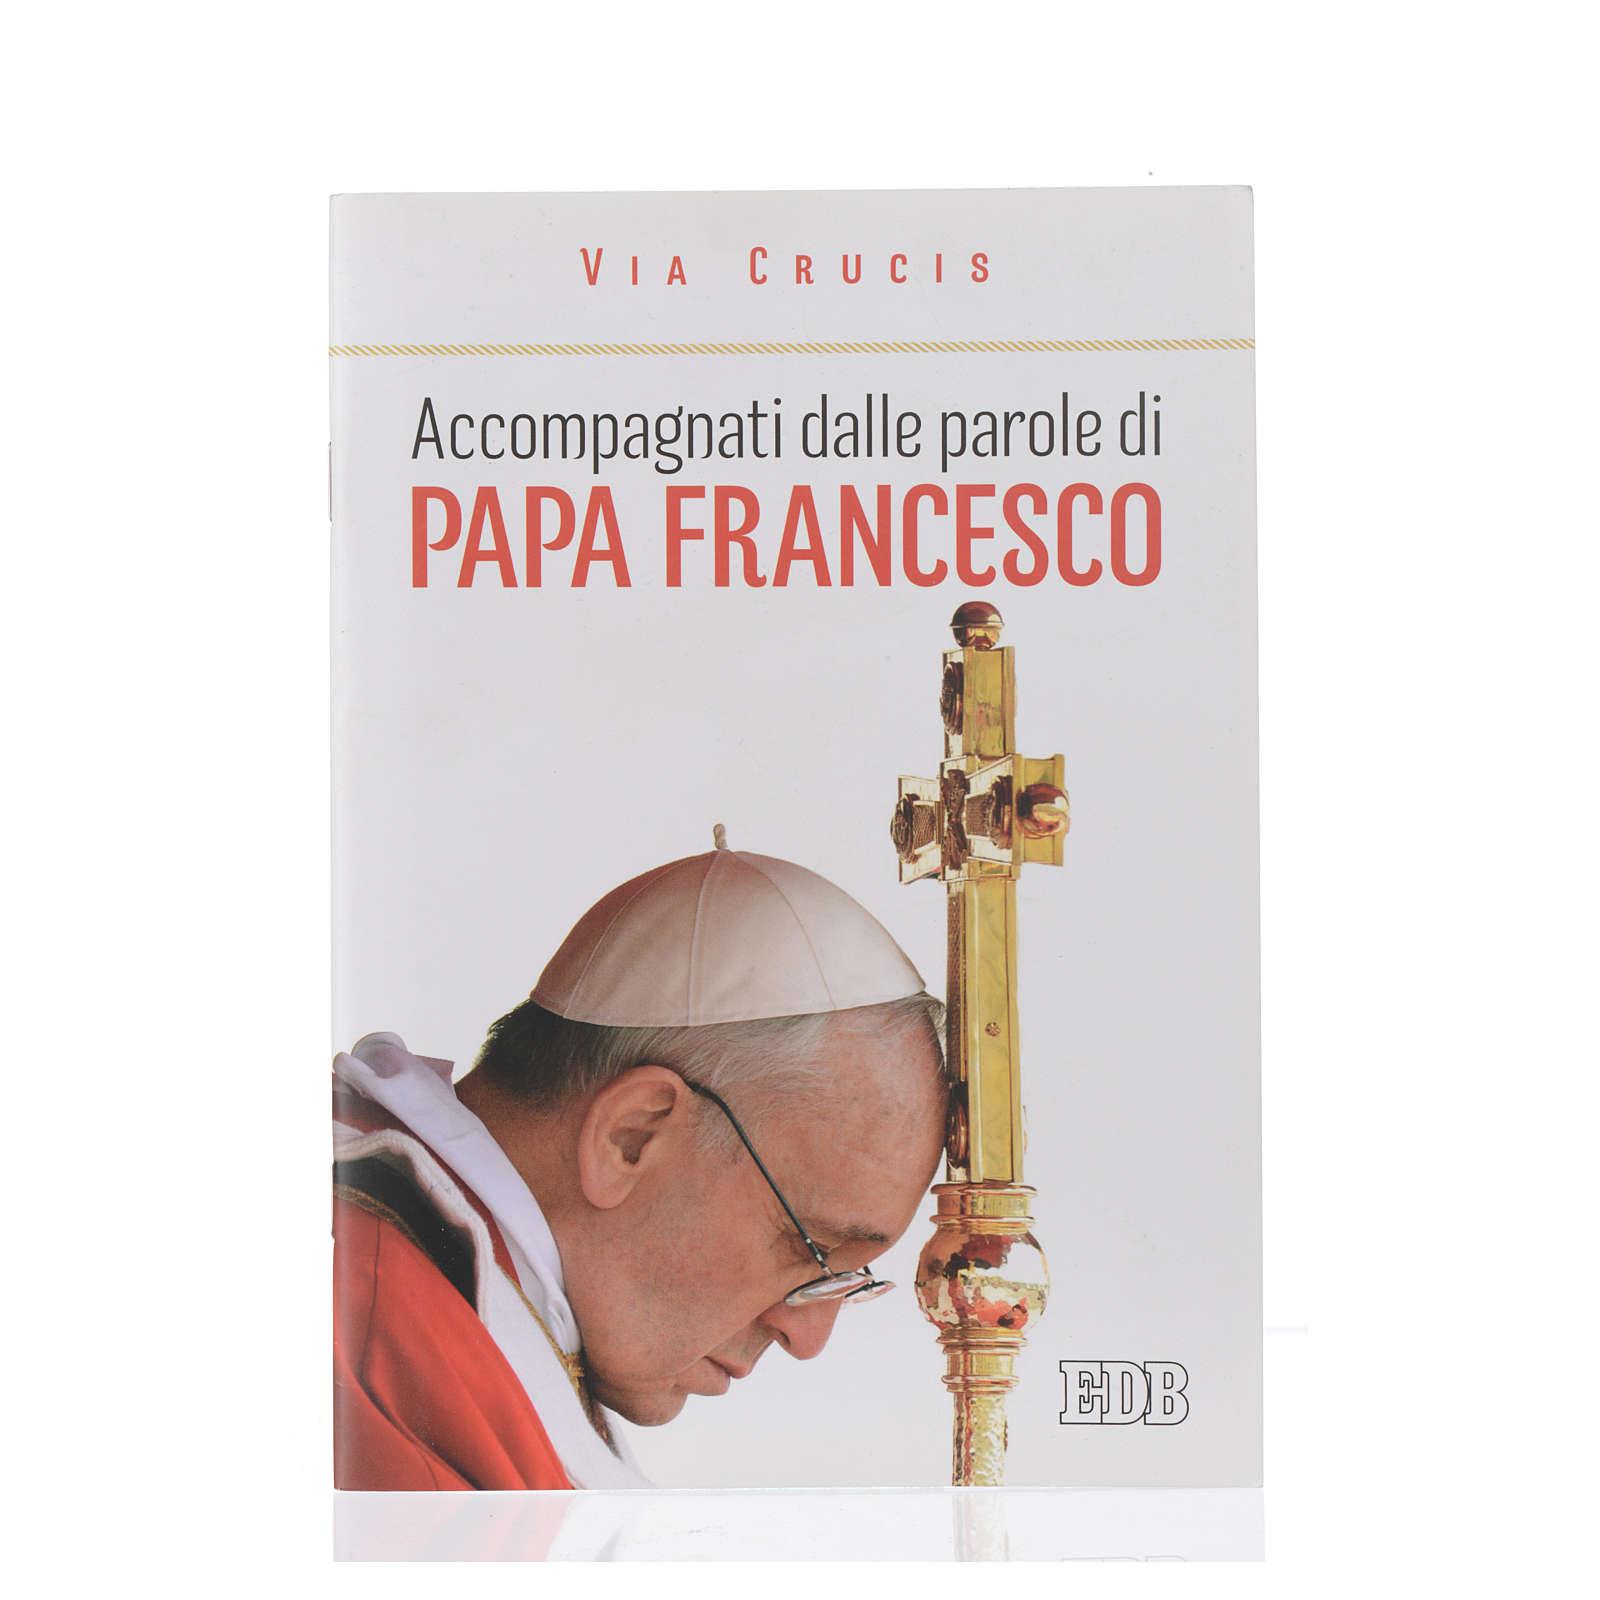 Via Crucis. Accompagnati dalle parole di Papa Francesco 4